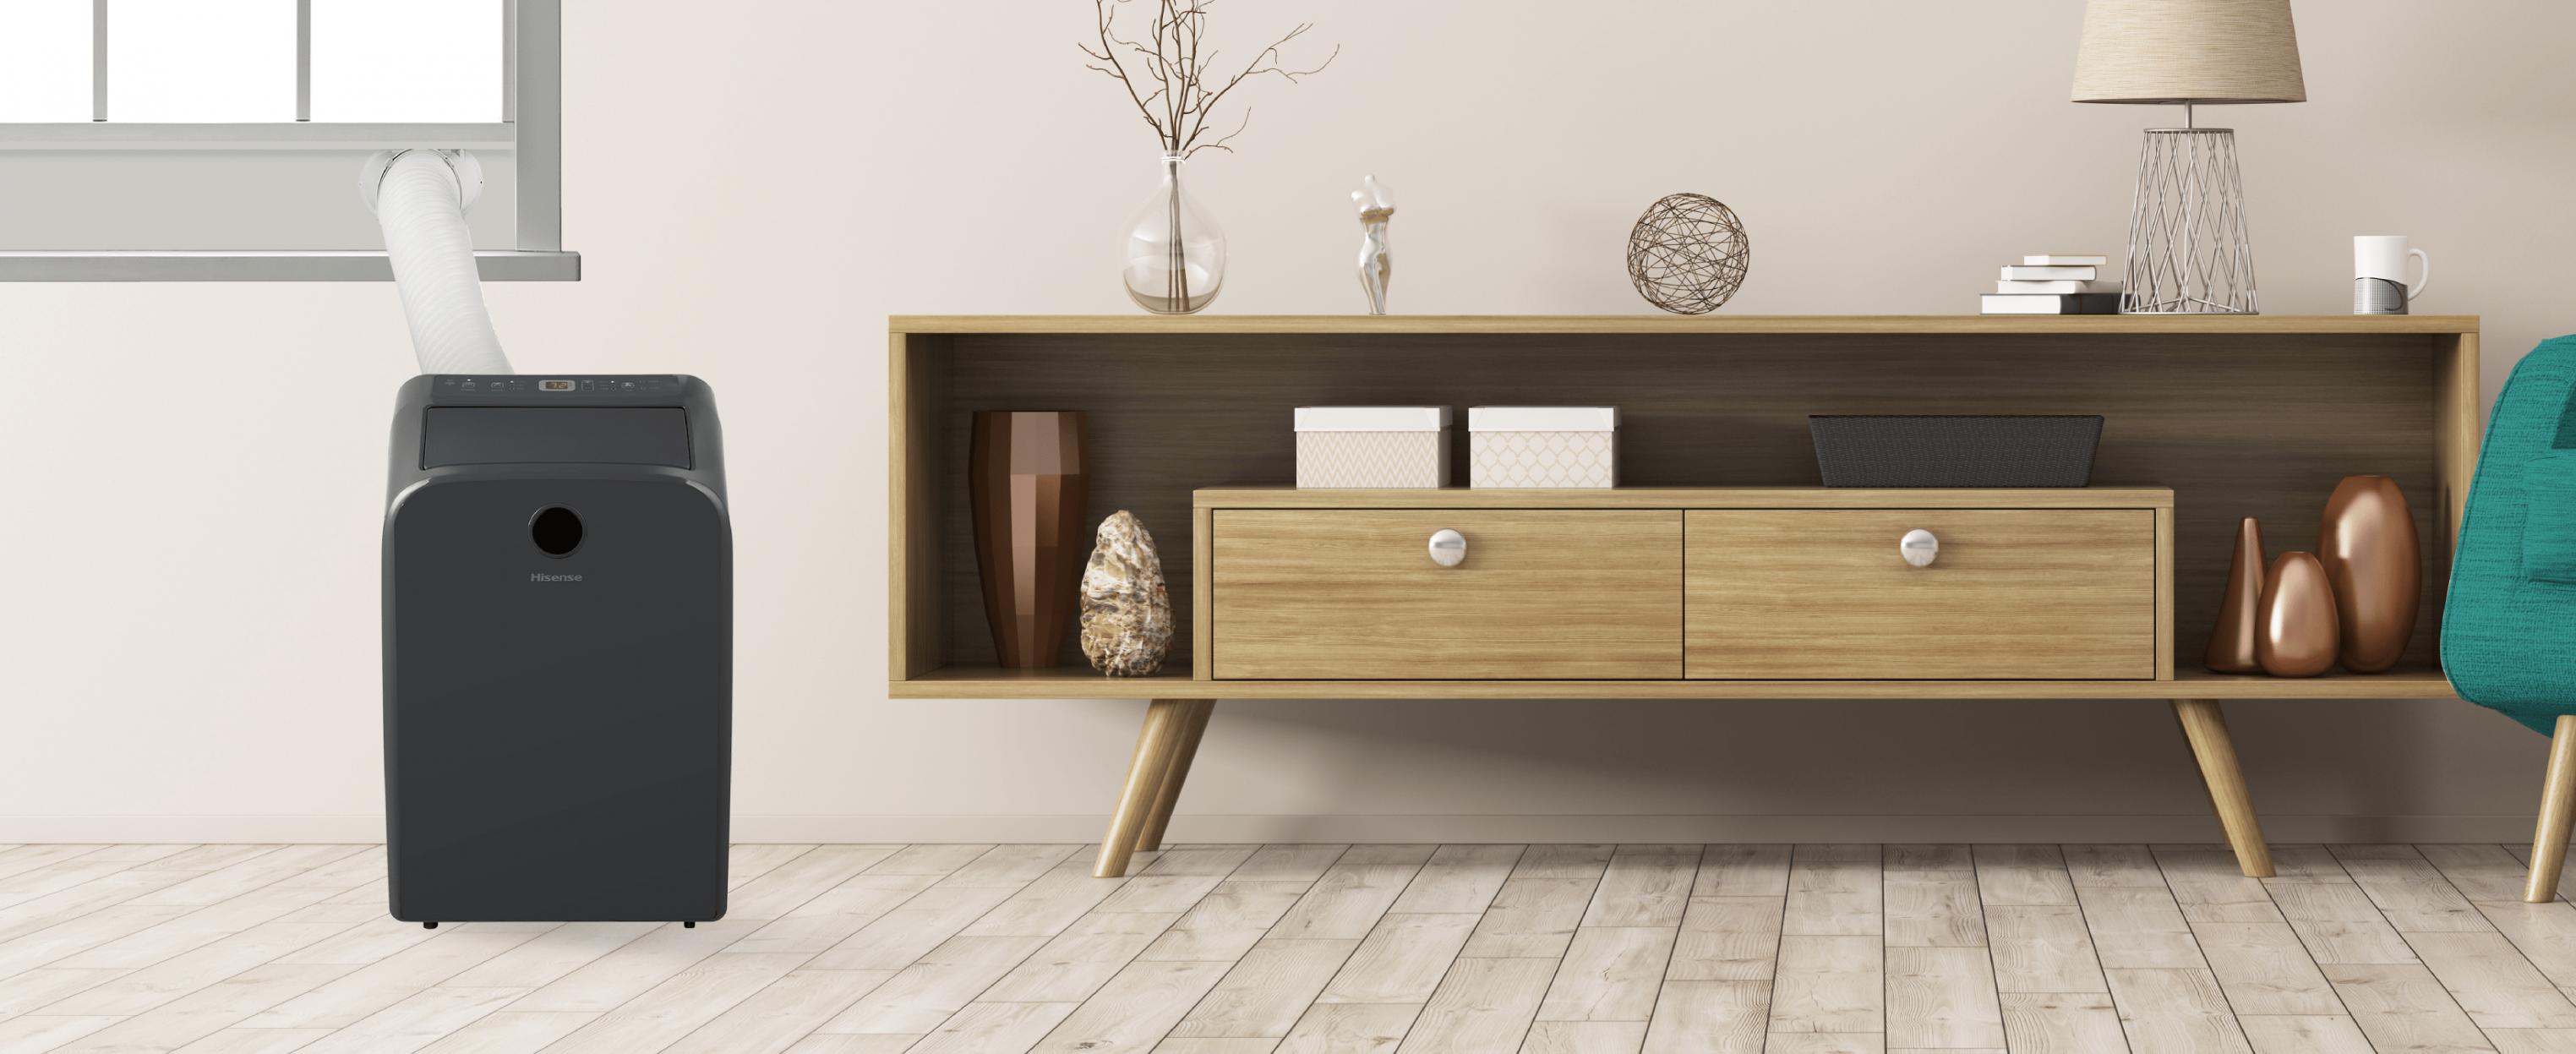 Intro Deck - Image